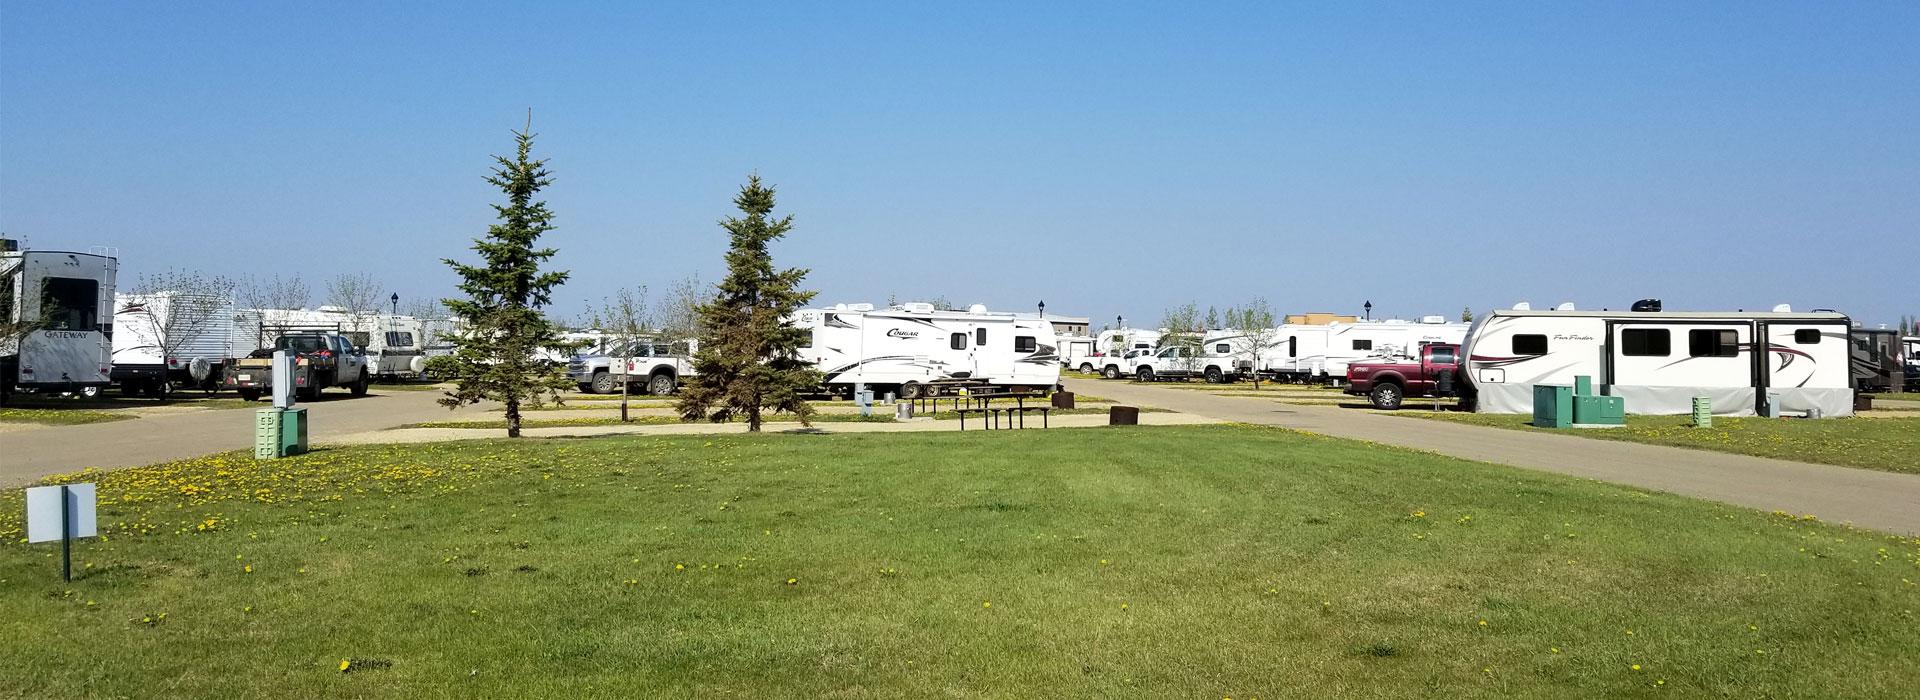 CRE-RV-Park-Campground-001